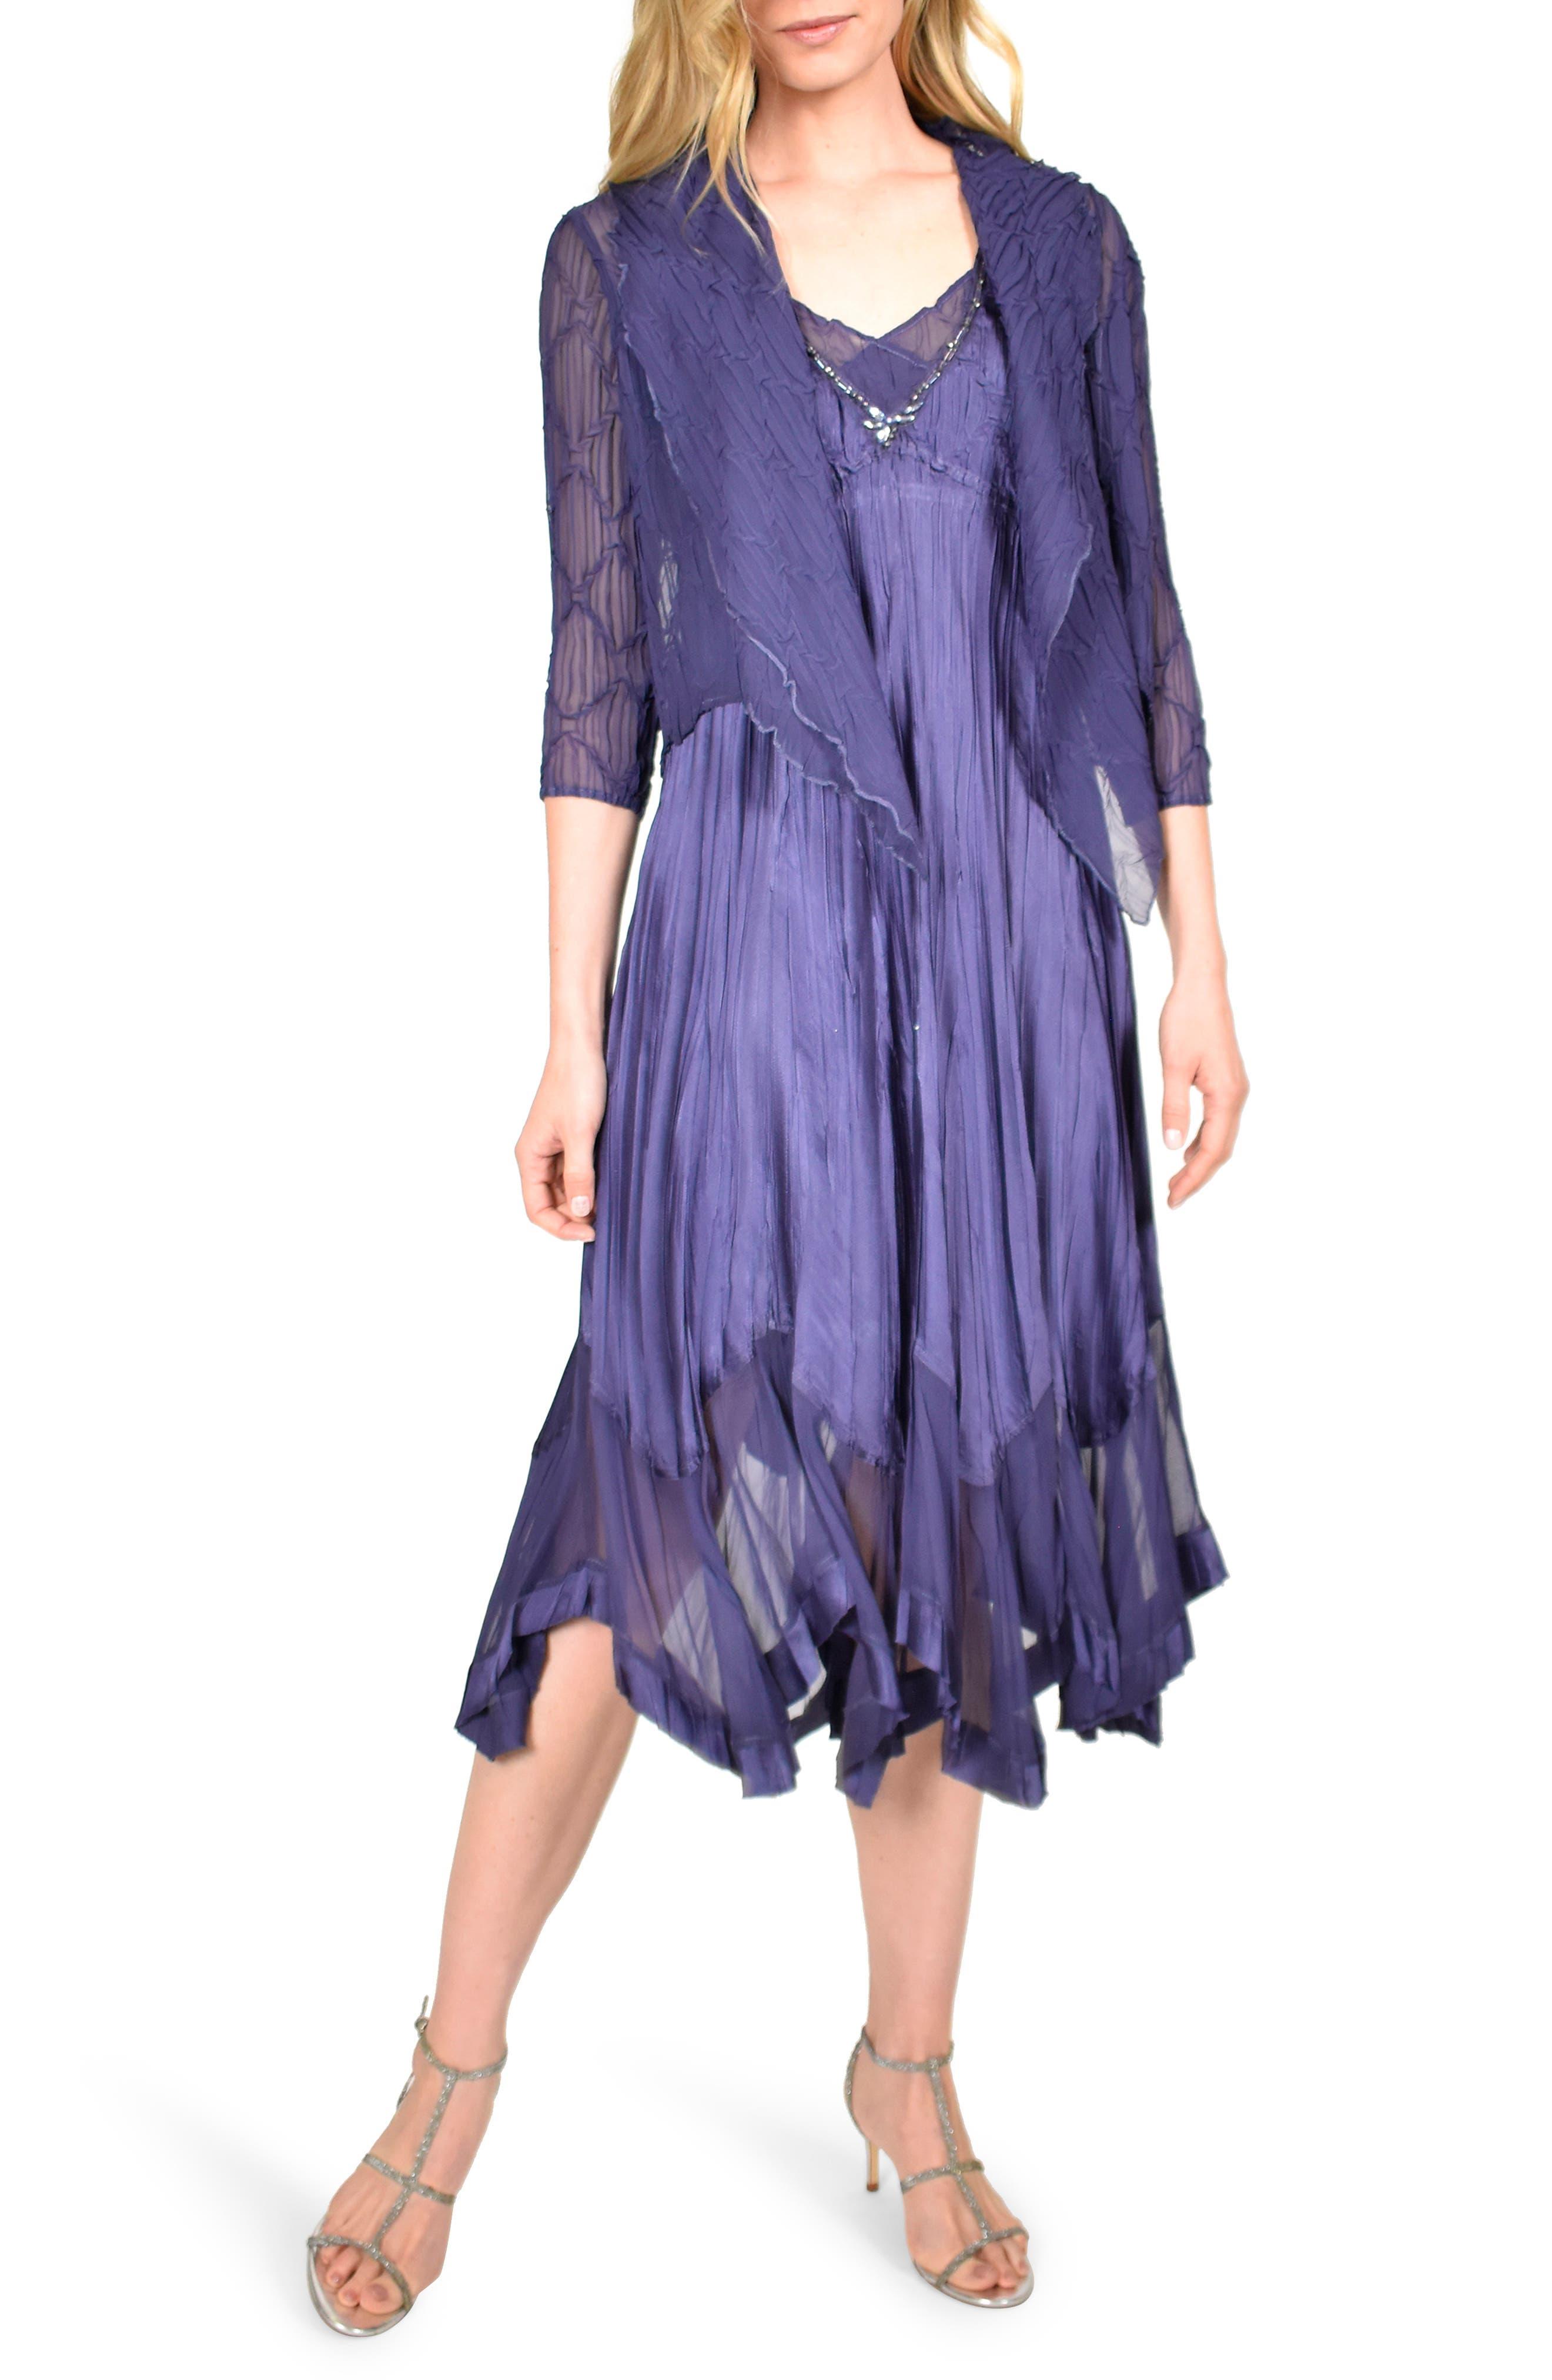 Vintage 1920s Dresses – Where to Buy Womens Komarov Beaded Neck Charmeuse Midi Dress With Chiffon Jacket $268.80 AT vintagedancer.com